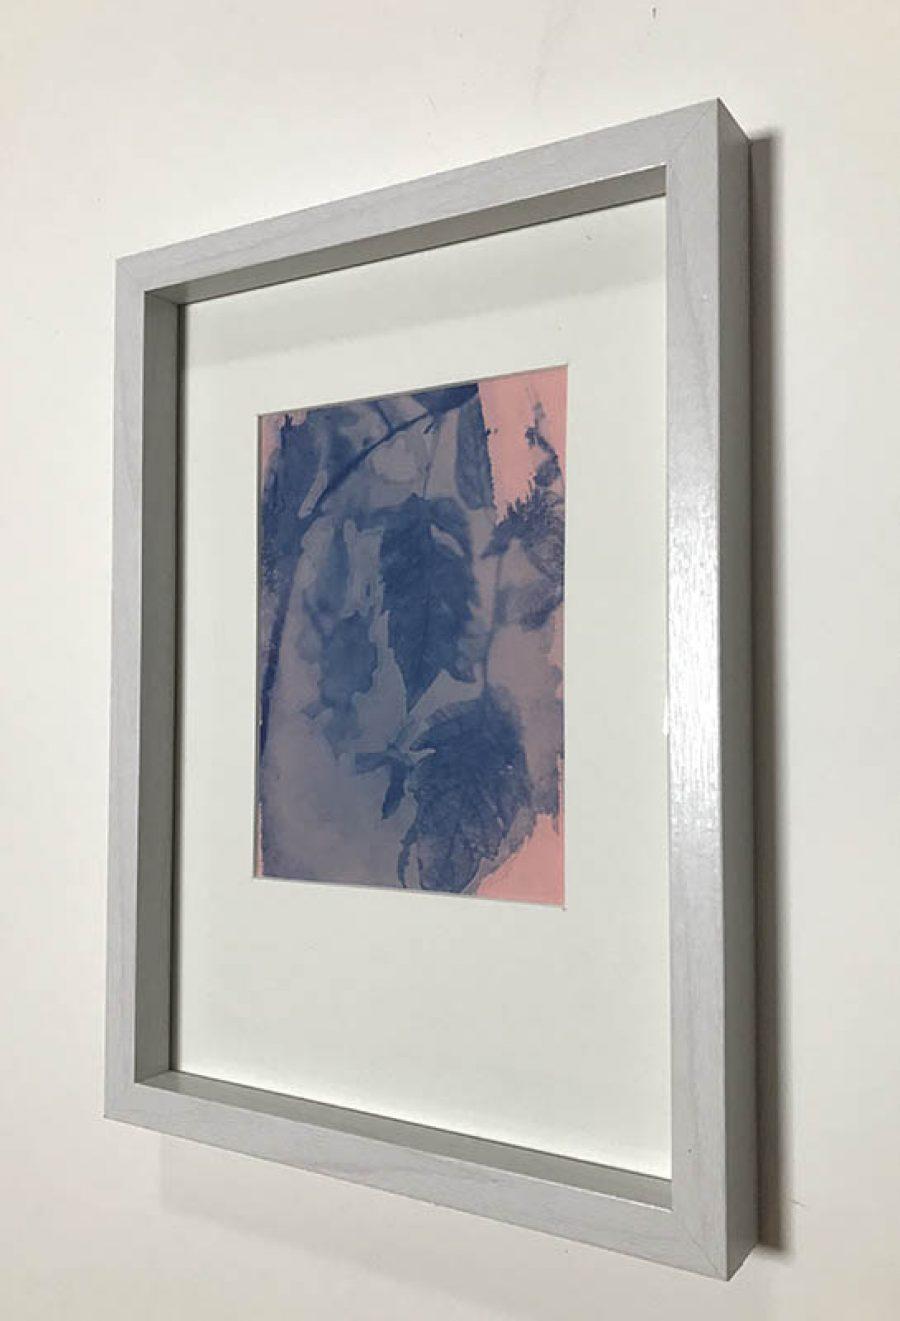 Seven    |   17 x 12 cm, frame 32 x 23 cm   |     SOLD